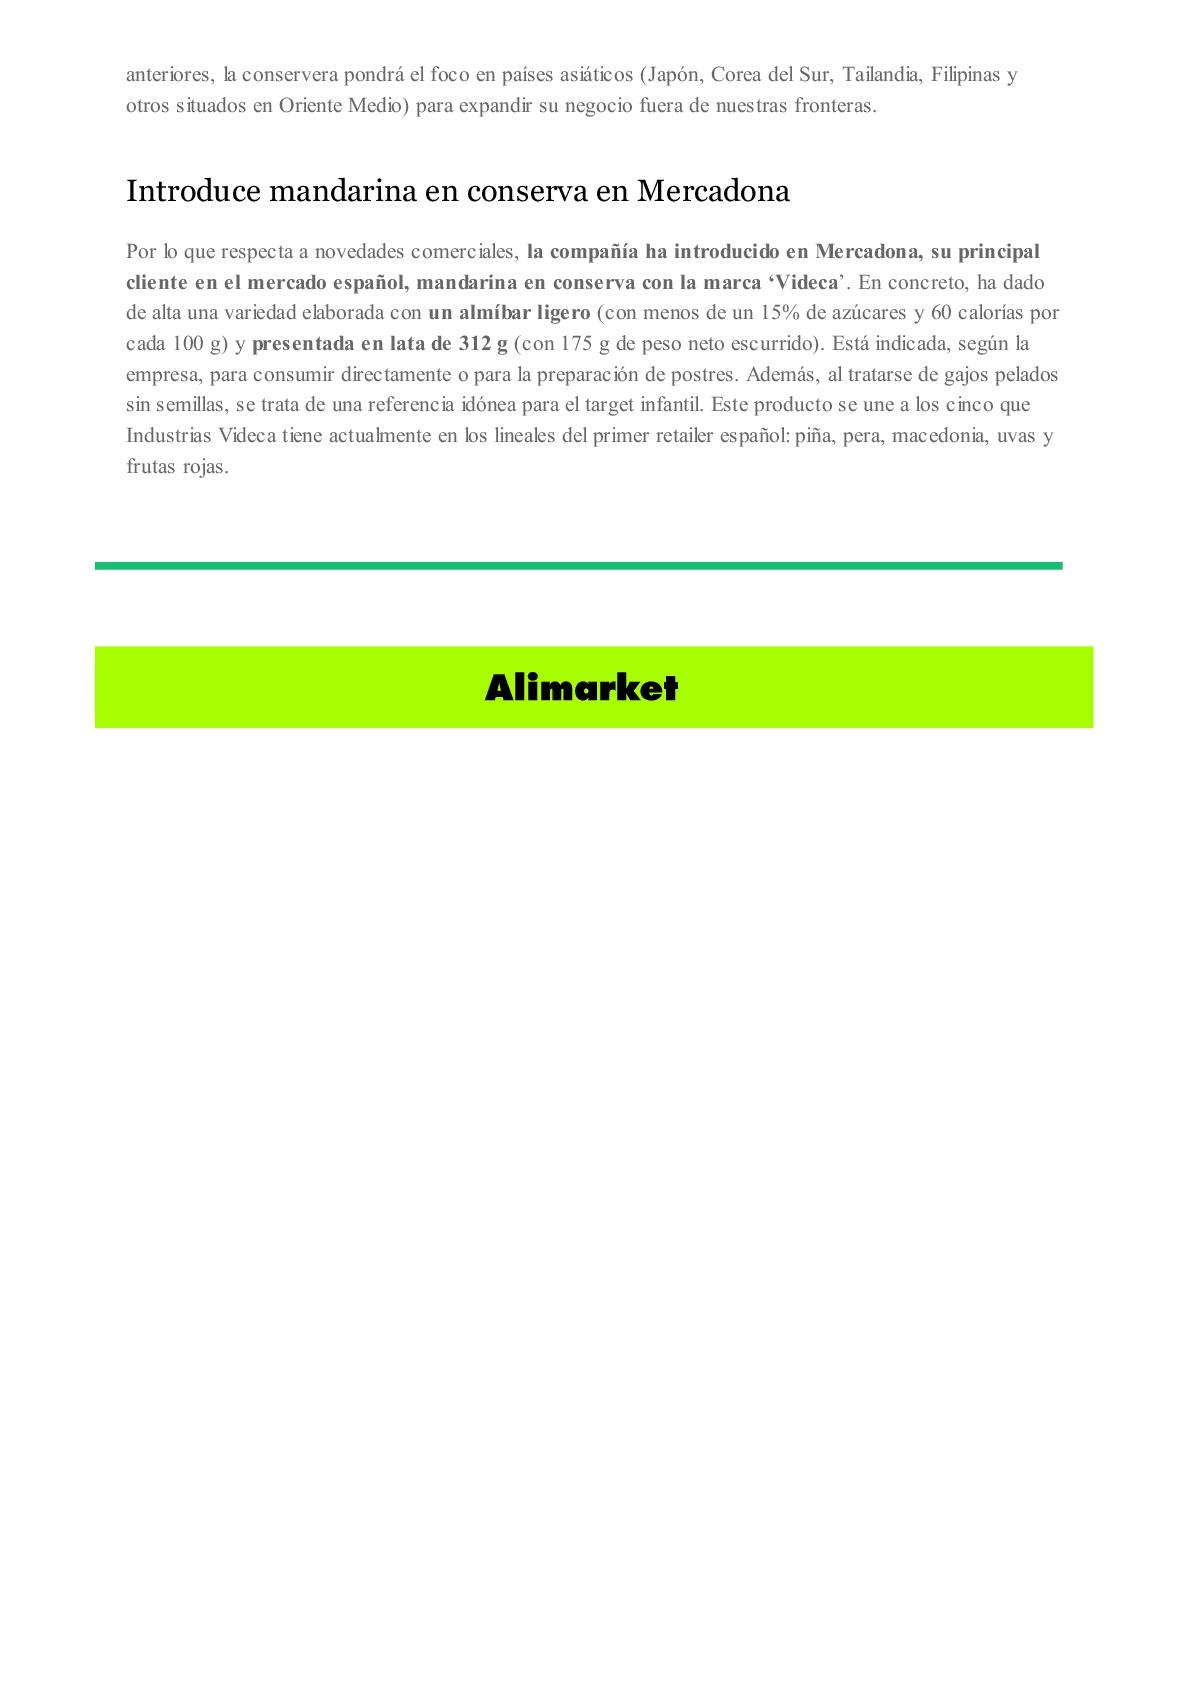 Videca-Alimarket-003